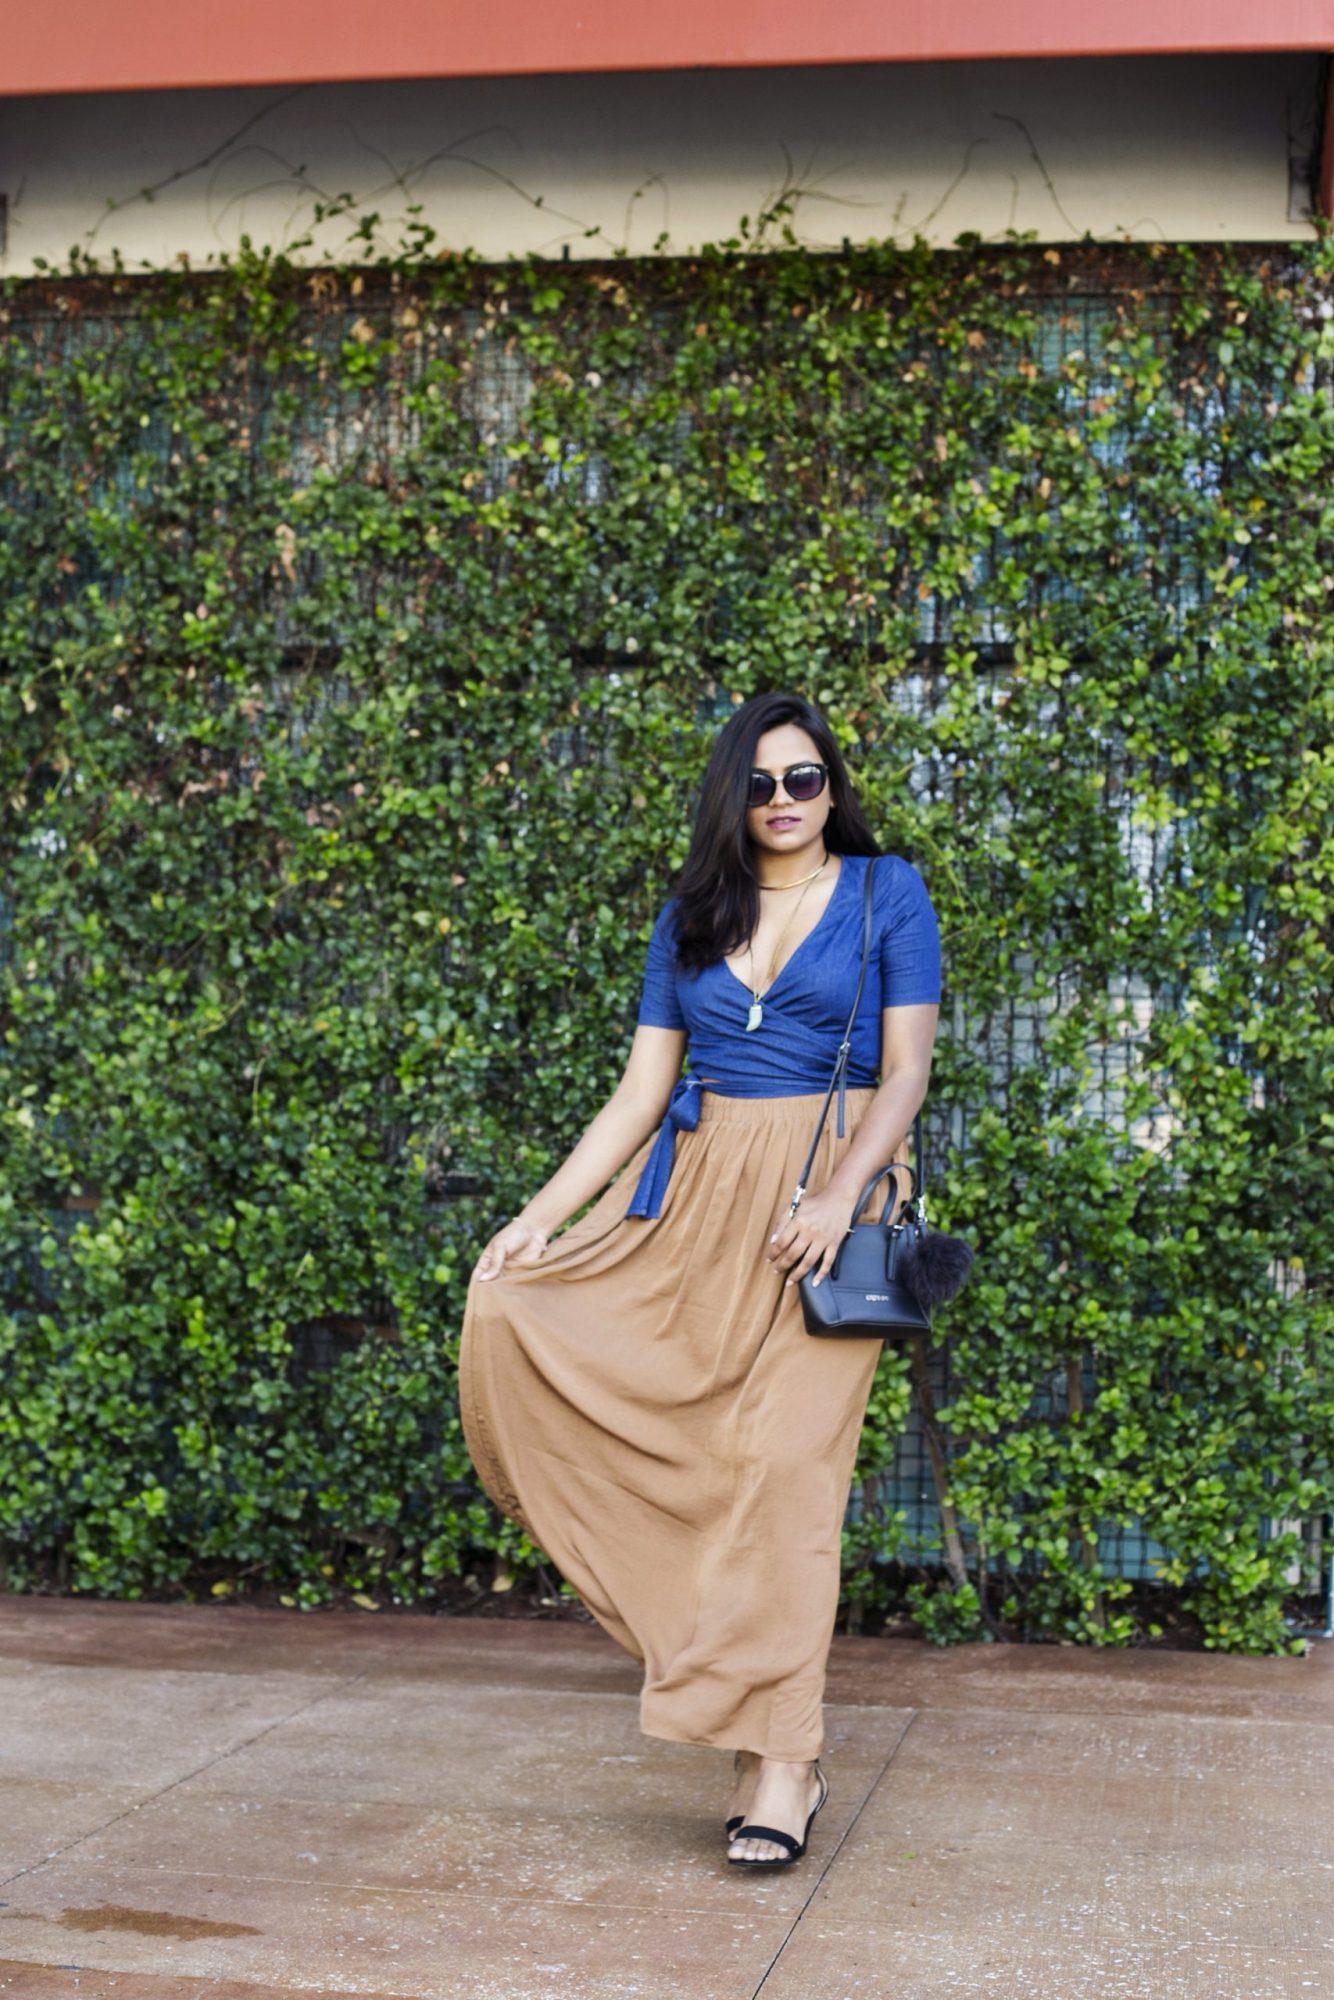 miami-fashion-blogger-afroza-khan